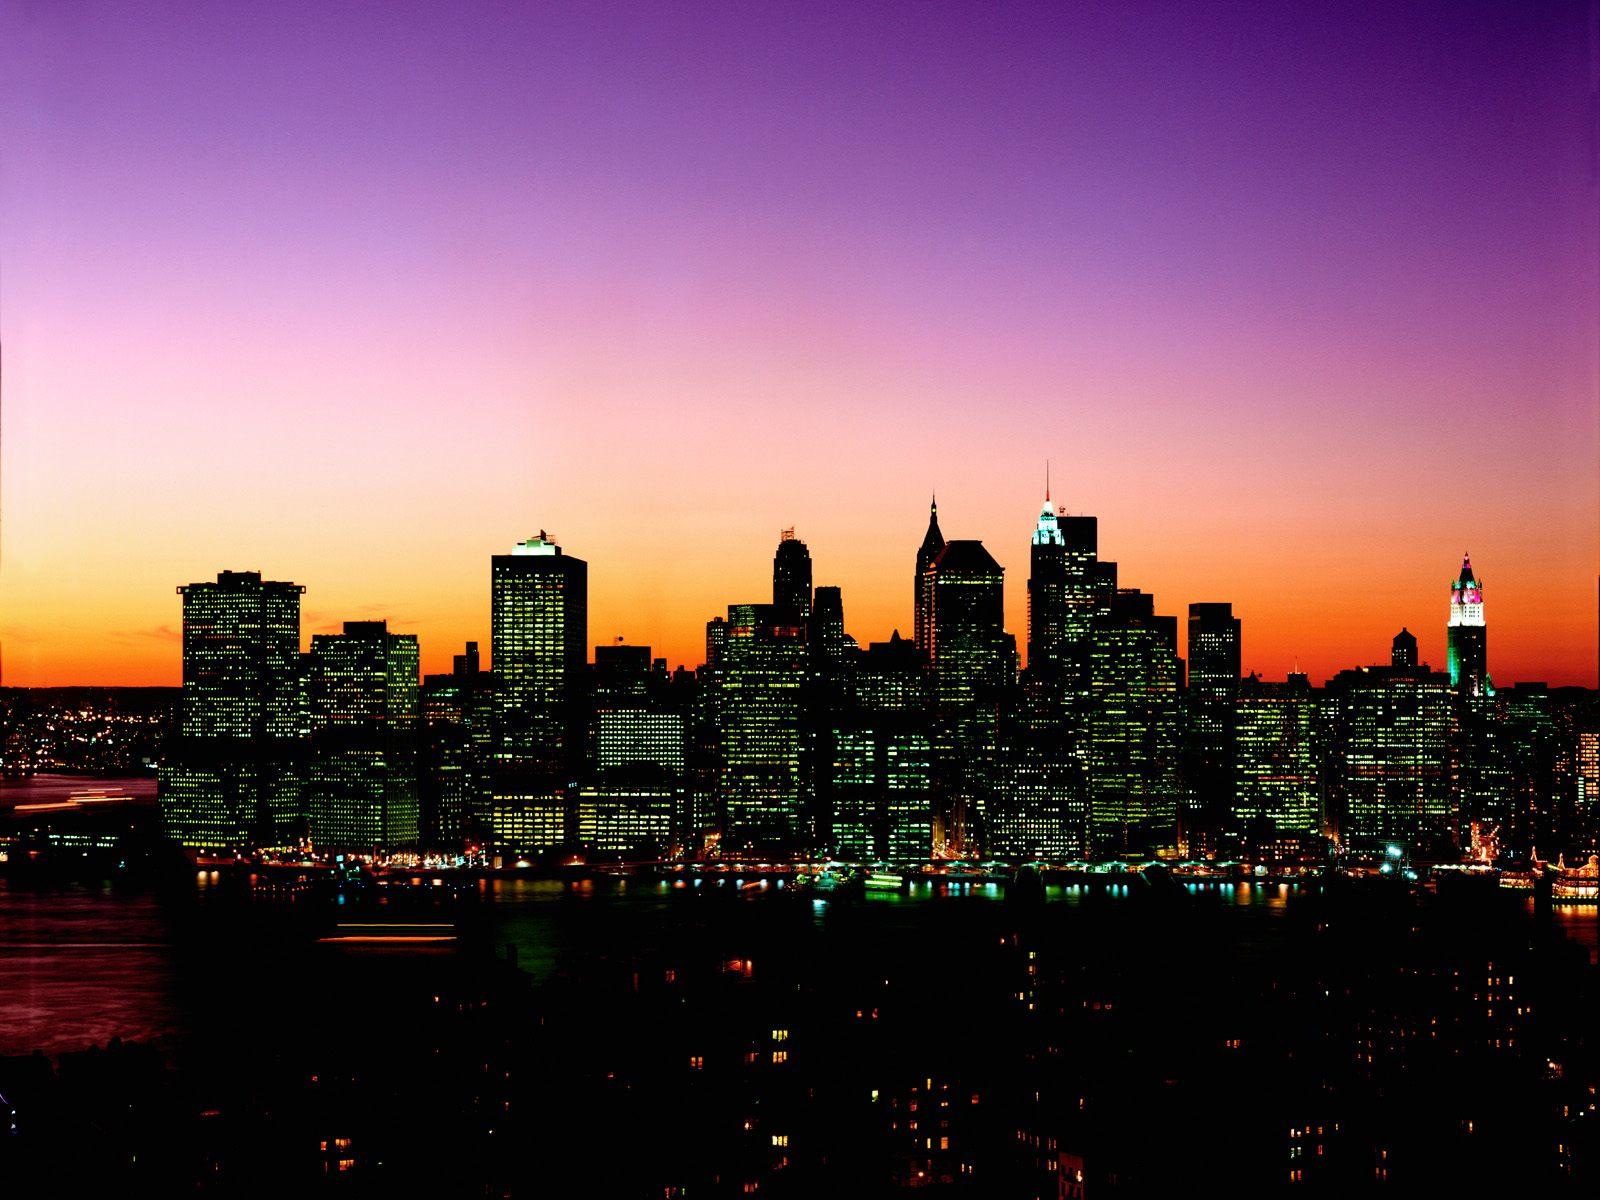 http://1.bp.blogspot.com/-tjMN9uhQ98Y/Tm0kU5-S9SI/AAAAAAAAChY/9jygZIh6-w8/s1600/Manhattan+Skyline+at+Twilight%252C+New+York.jpg